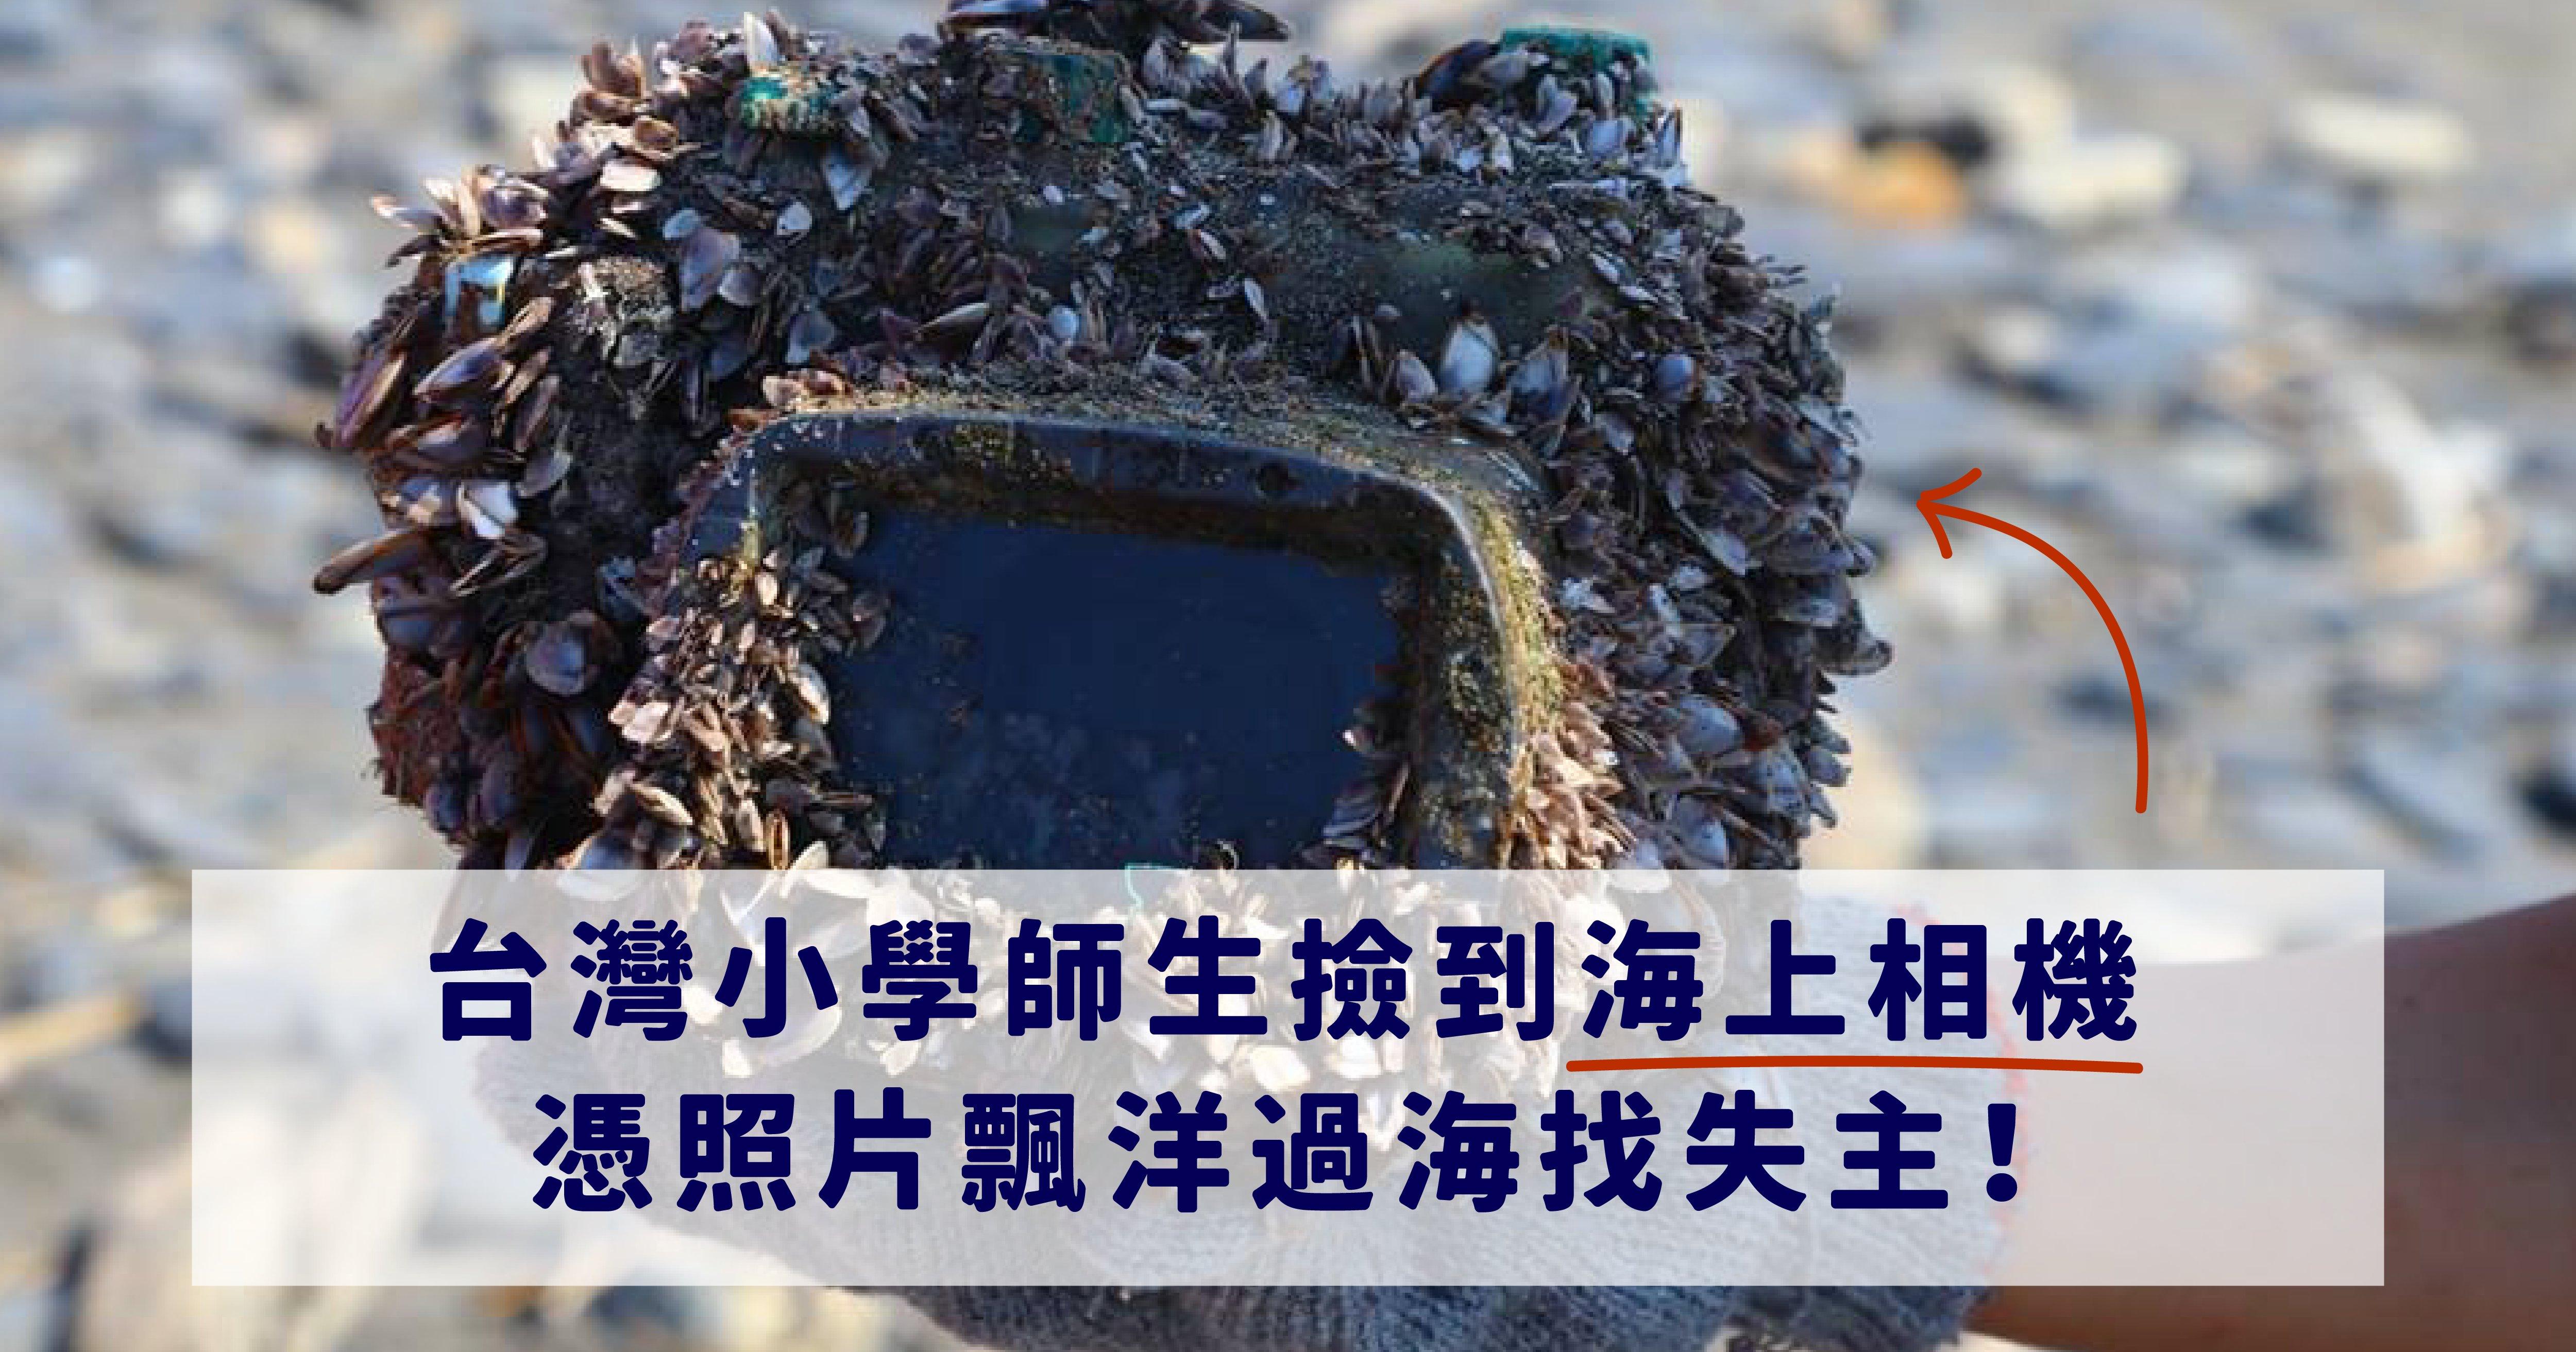 e69caae591bde5908d 3 01.png?resize=1200,630 - 相機海上漂流記!台灣小學師生撿到海漂單眼 透過照片找日本失主